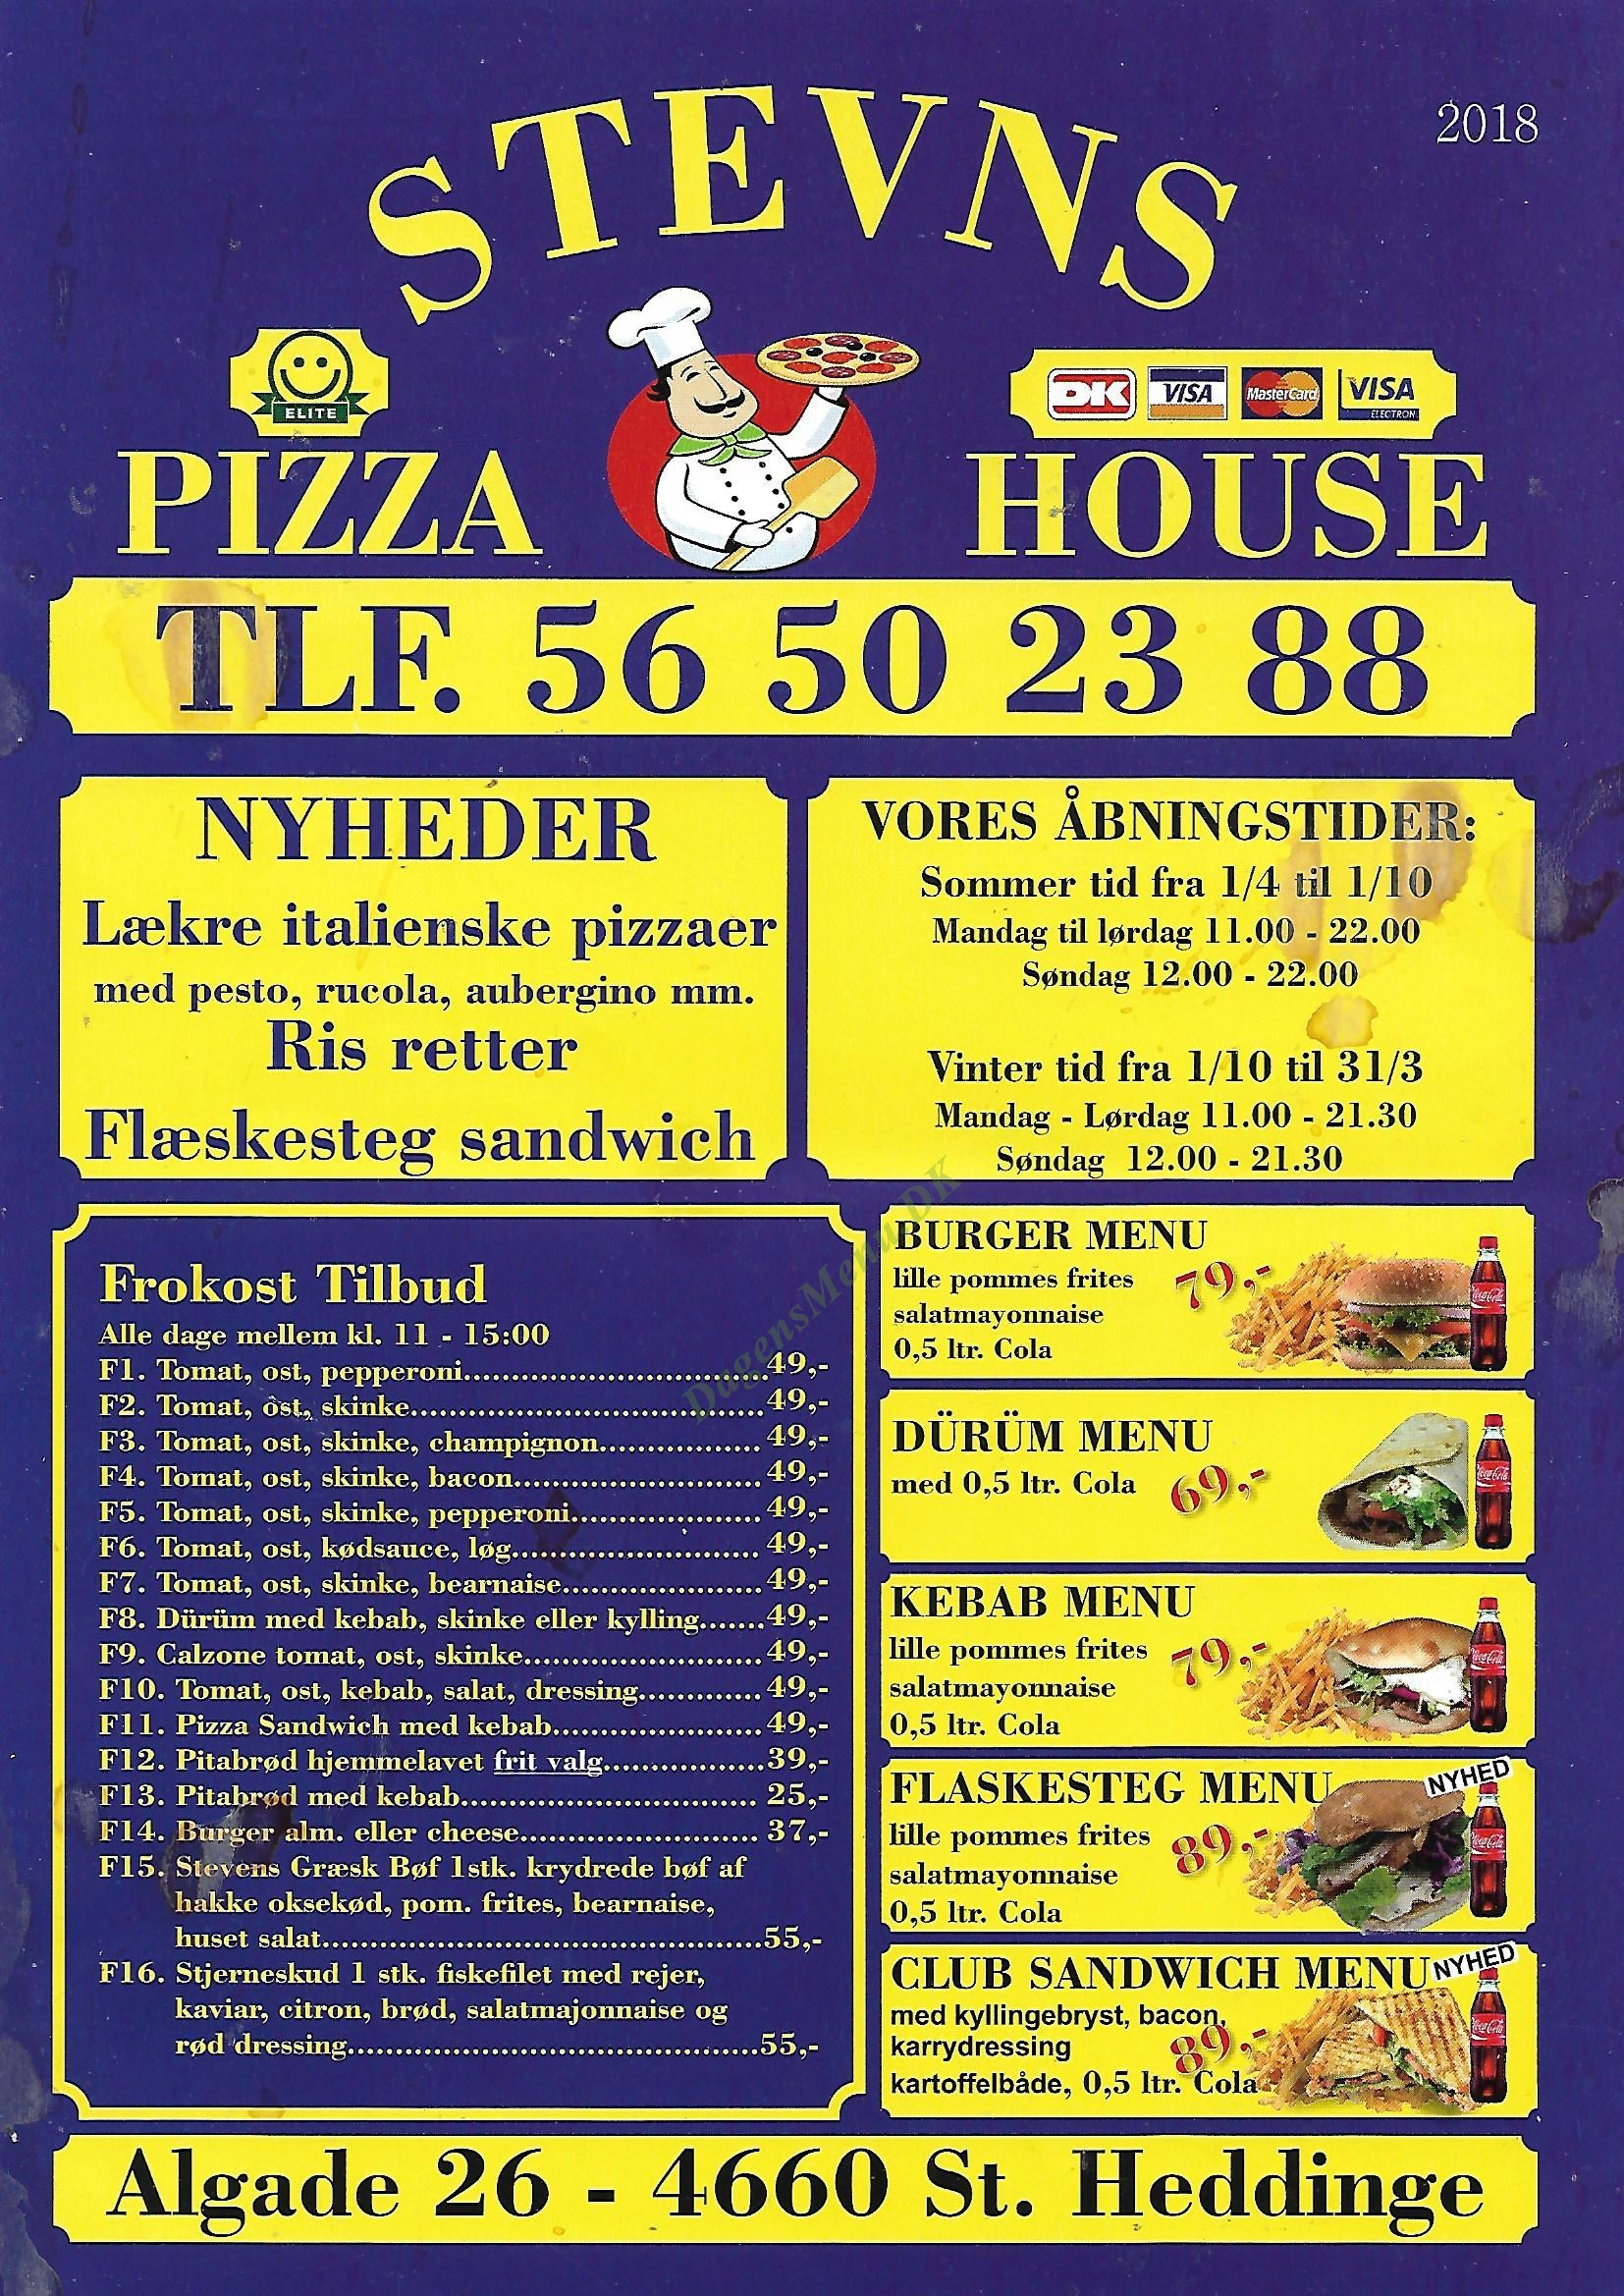 Stevns Pizza House - Menukort